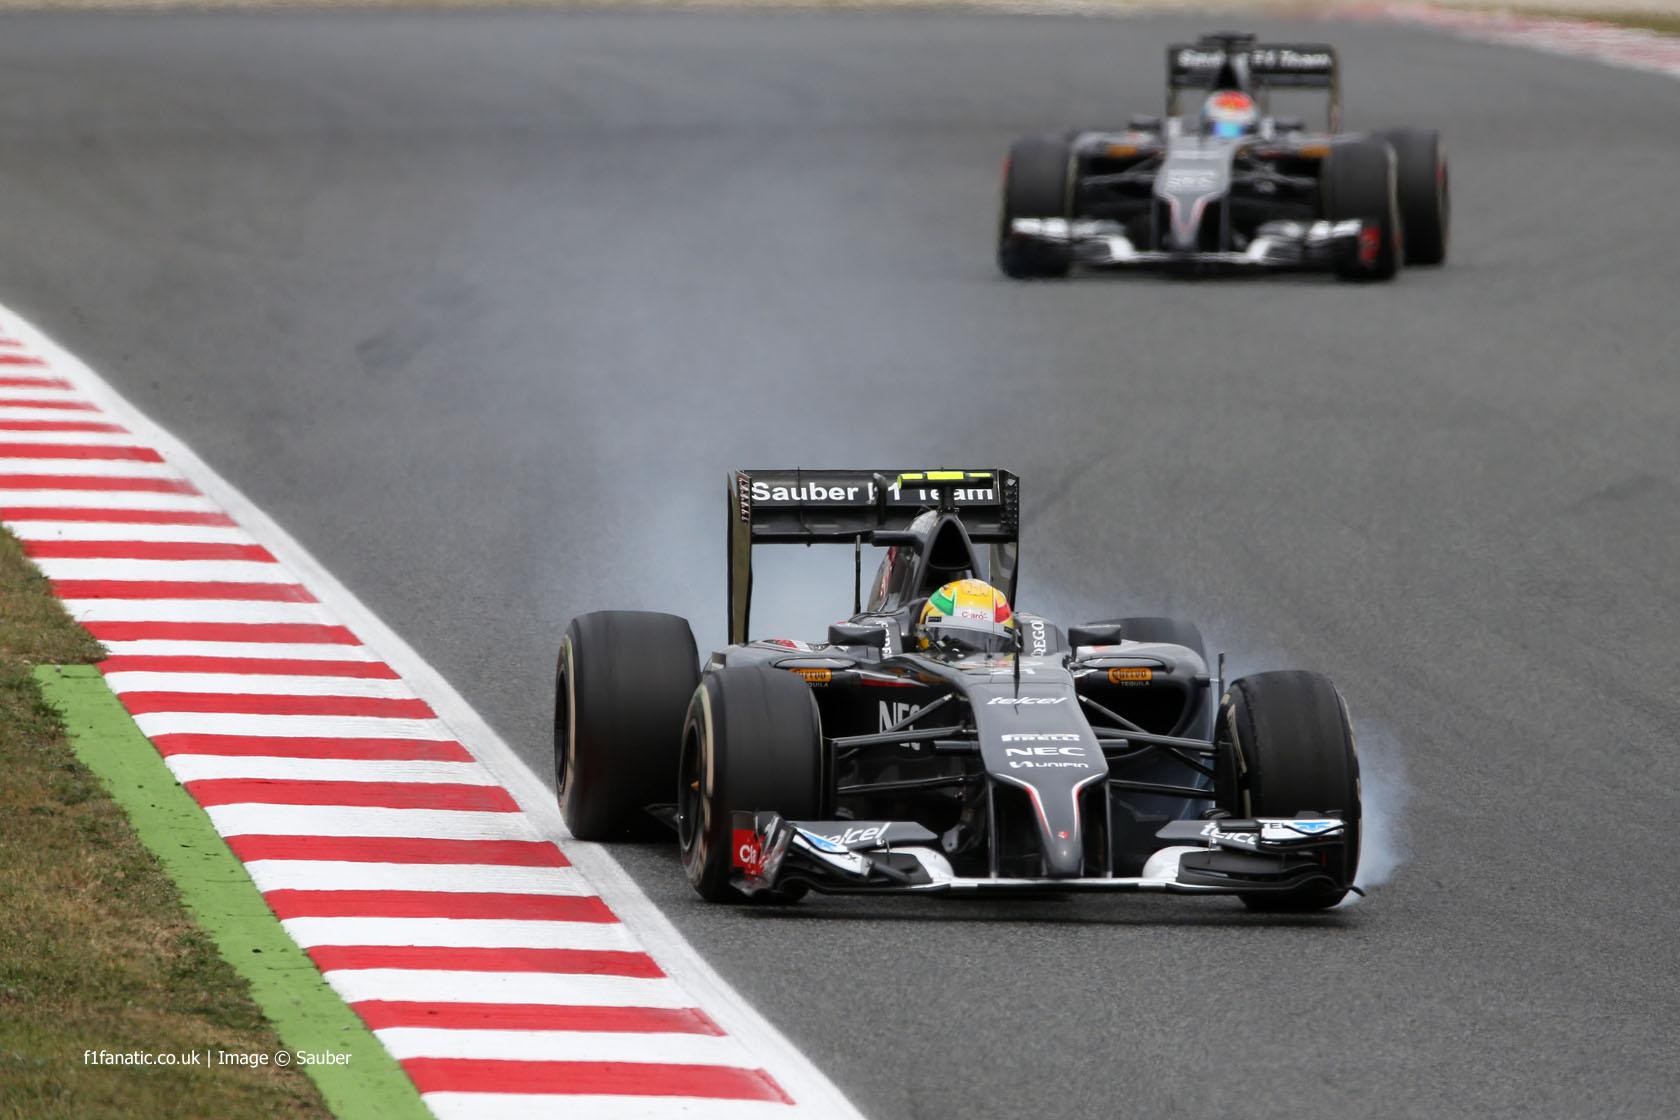 Esteban Gutierrez, Sauber, Circuit de Catalunya, 2014